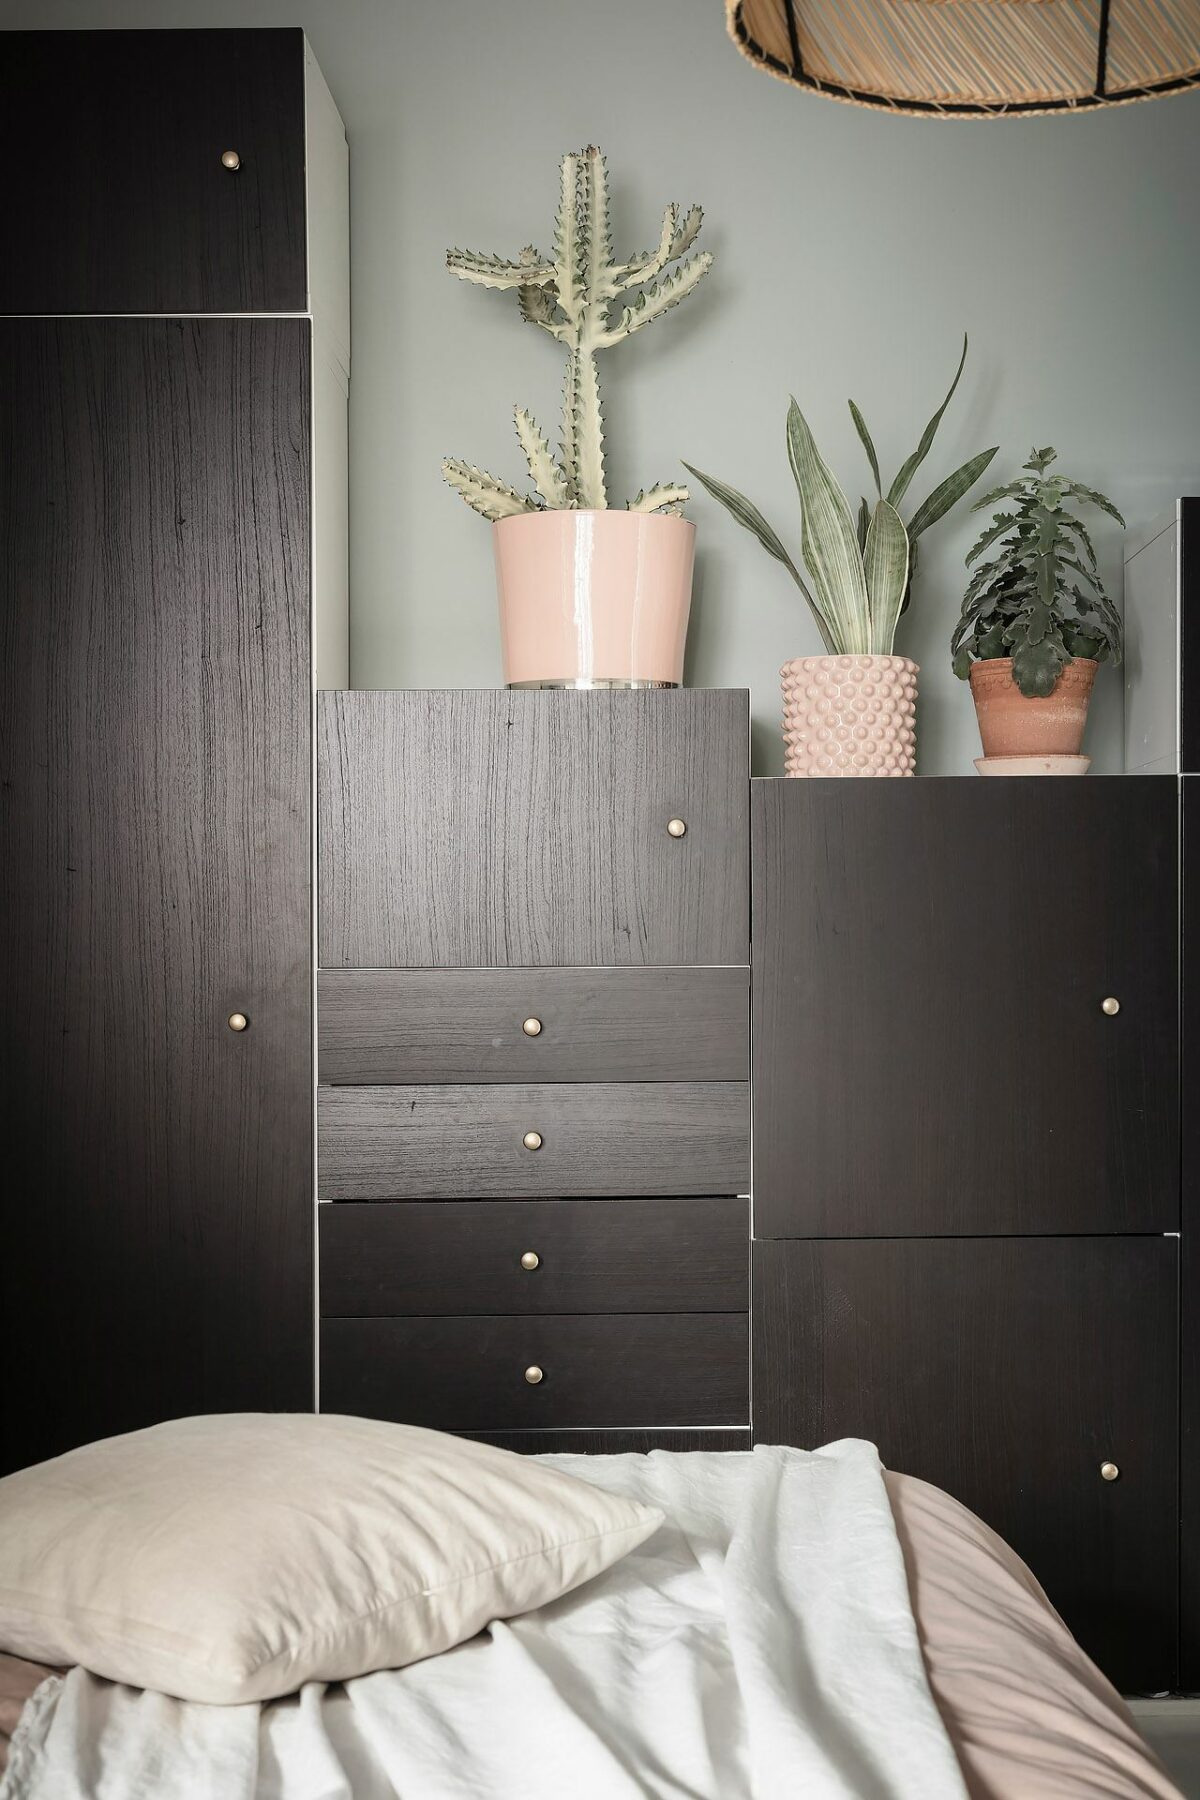 placard dressing escalier noir blanc rangement - blog déco - clemaroundthecorner